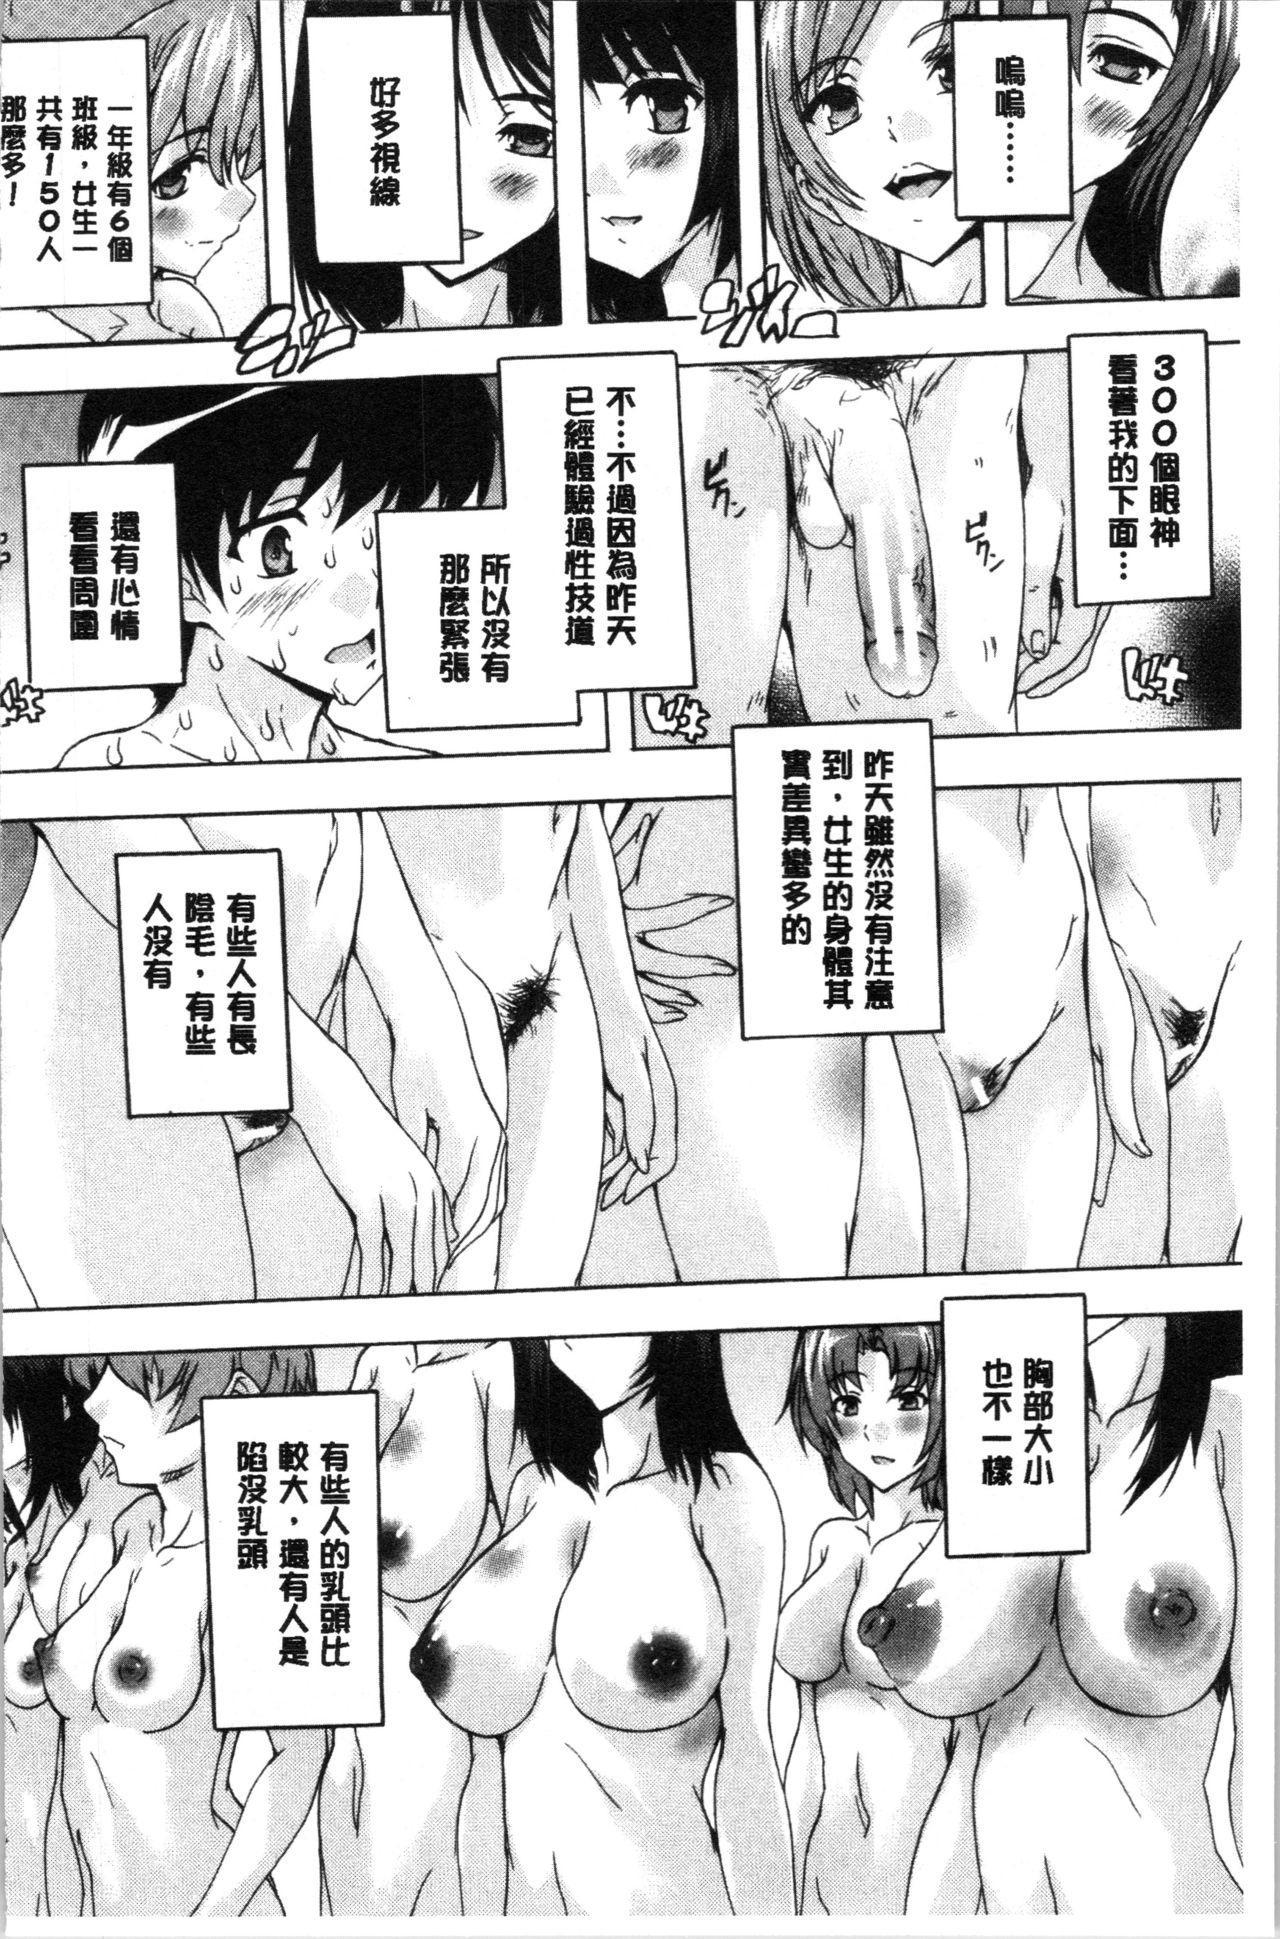 [Natsuka Q-Ya] Hisshuu!! Sex-bu - SEIGI-DO The Ultimate Martial Arts   必修!!性愛淫交部 [Chinese] 40